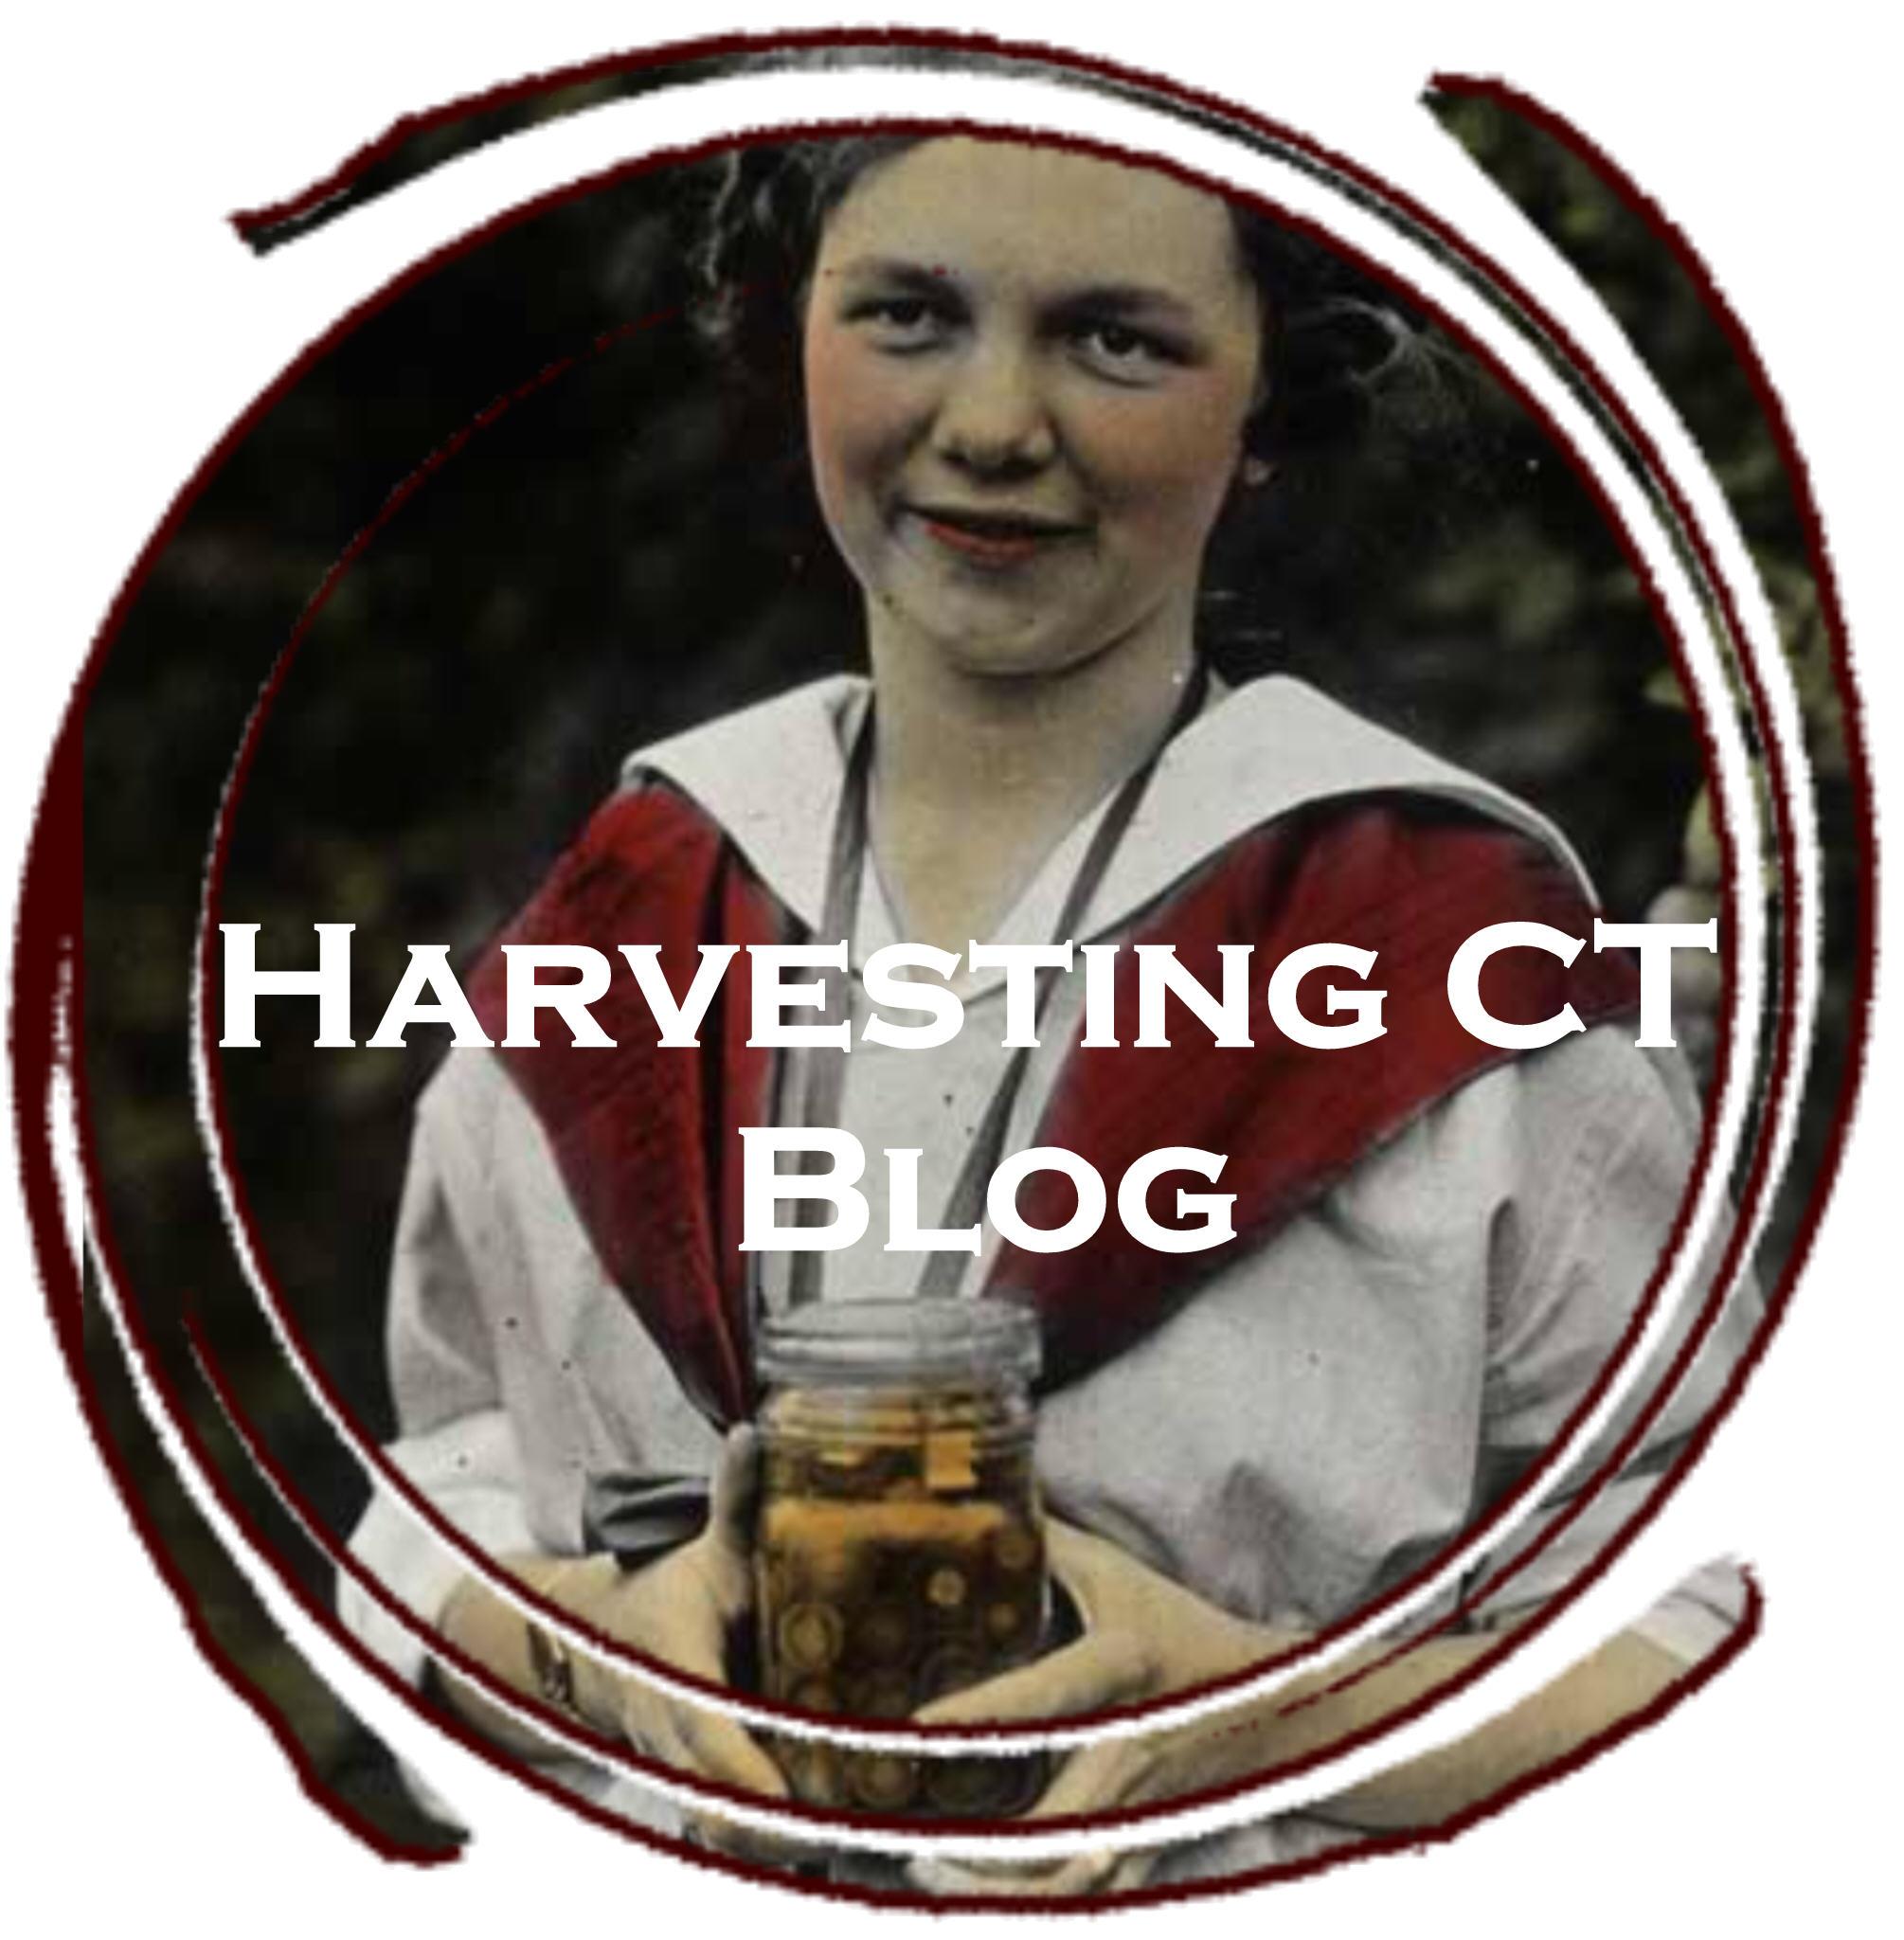 Harvesting CT Blog